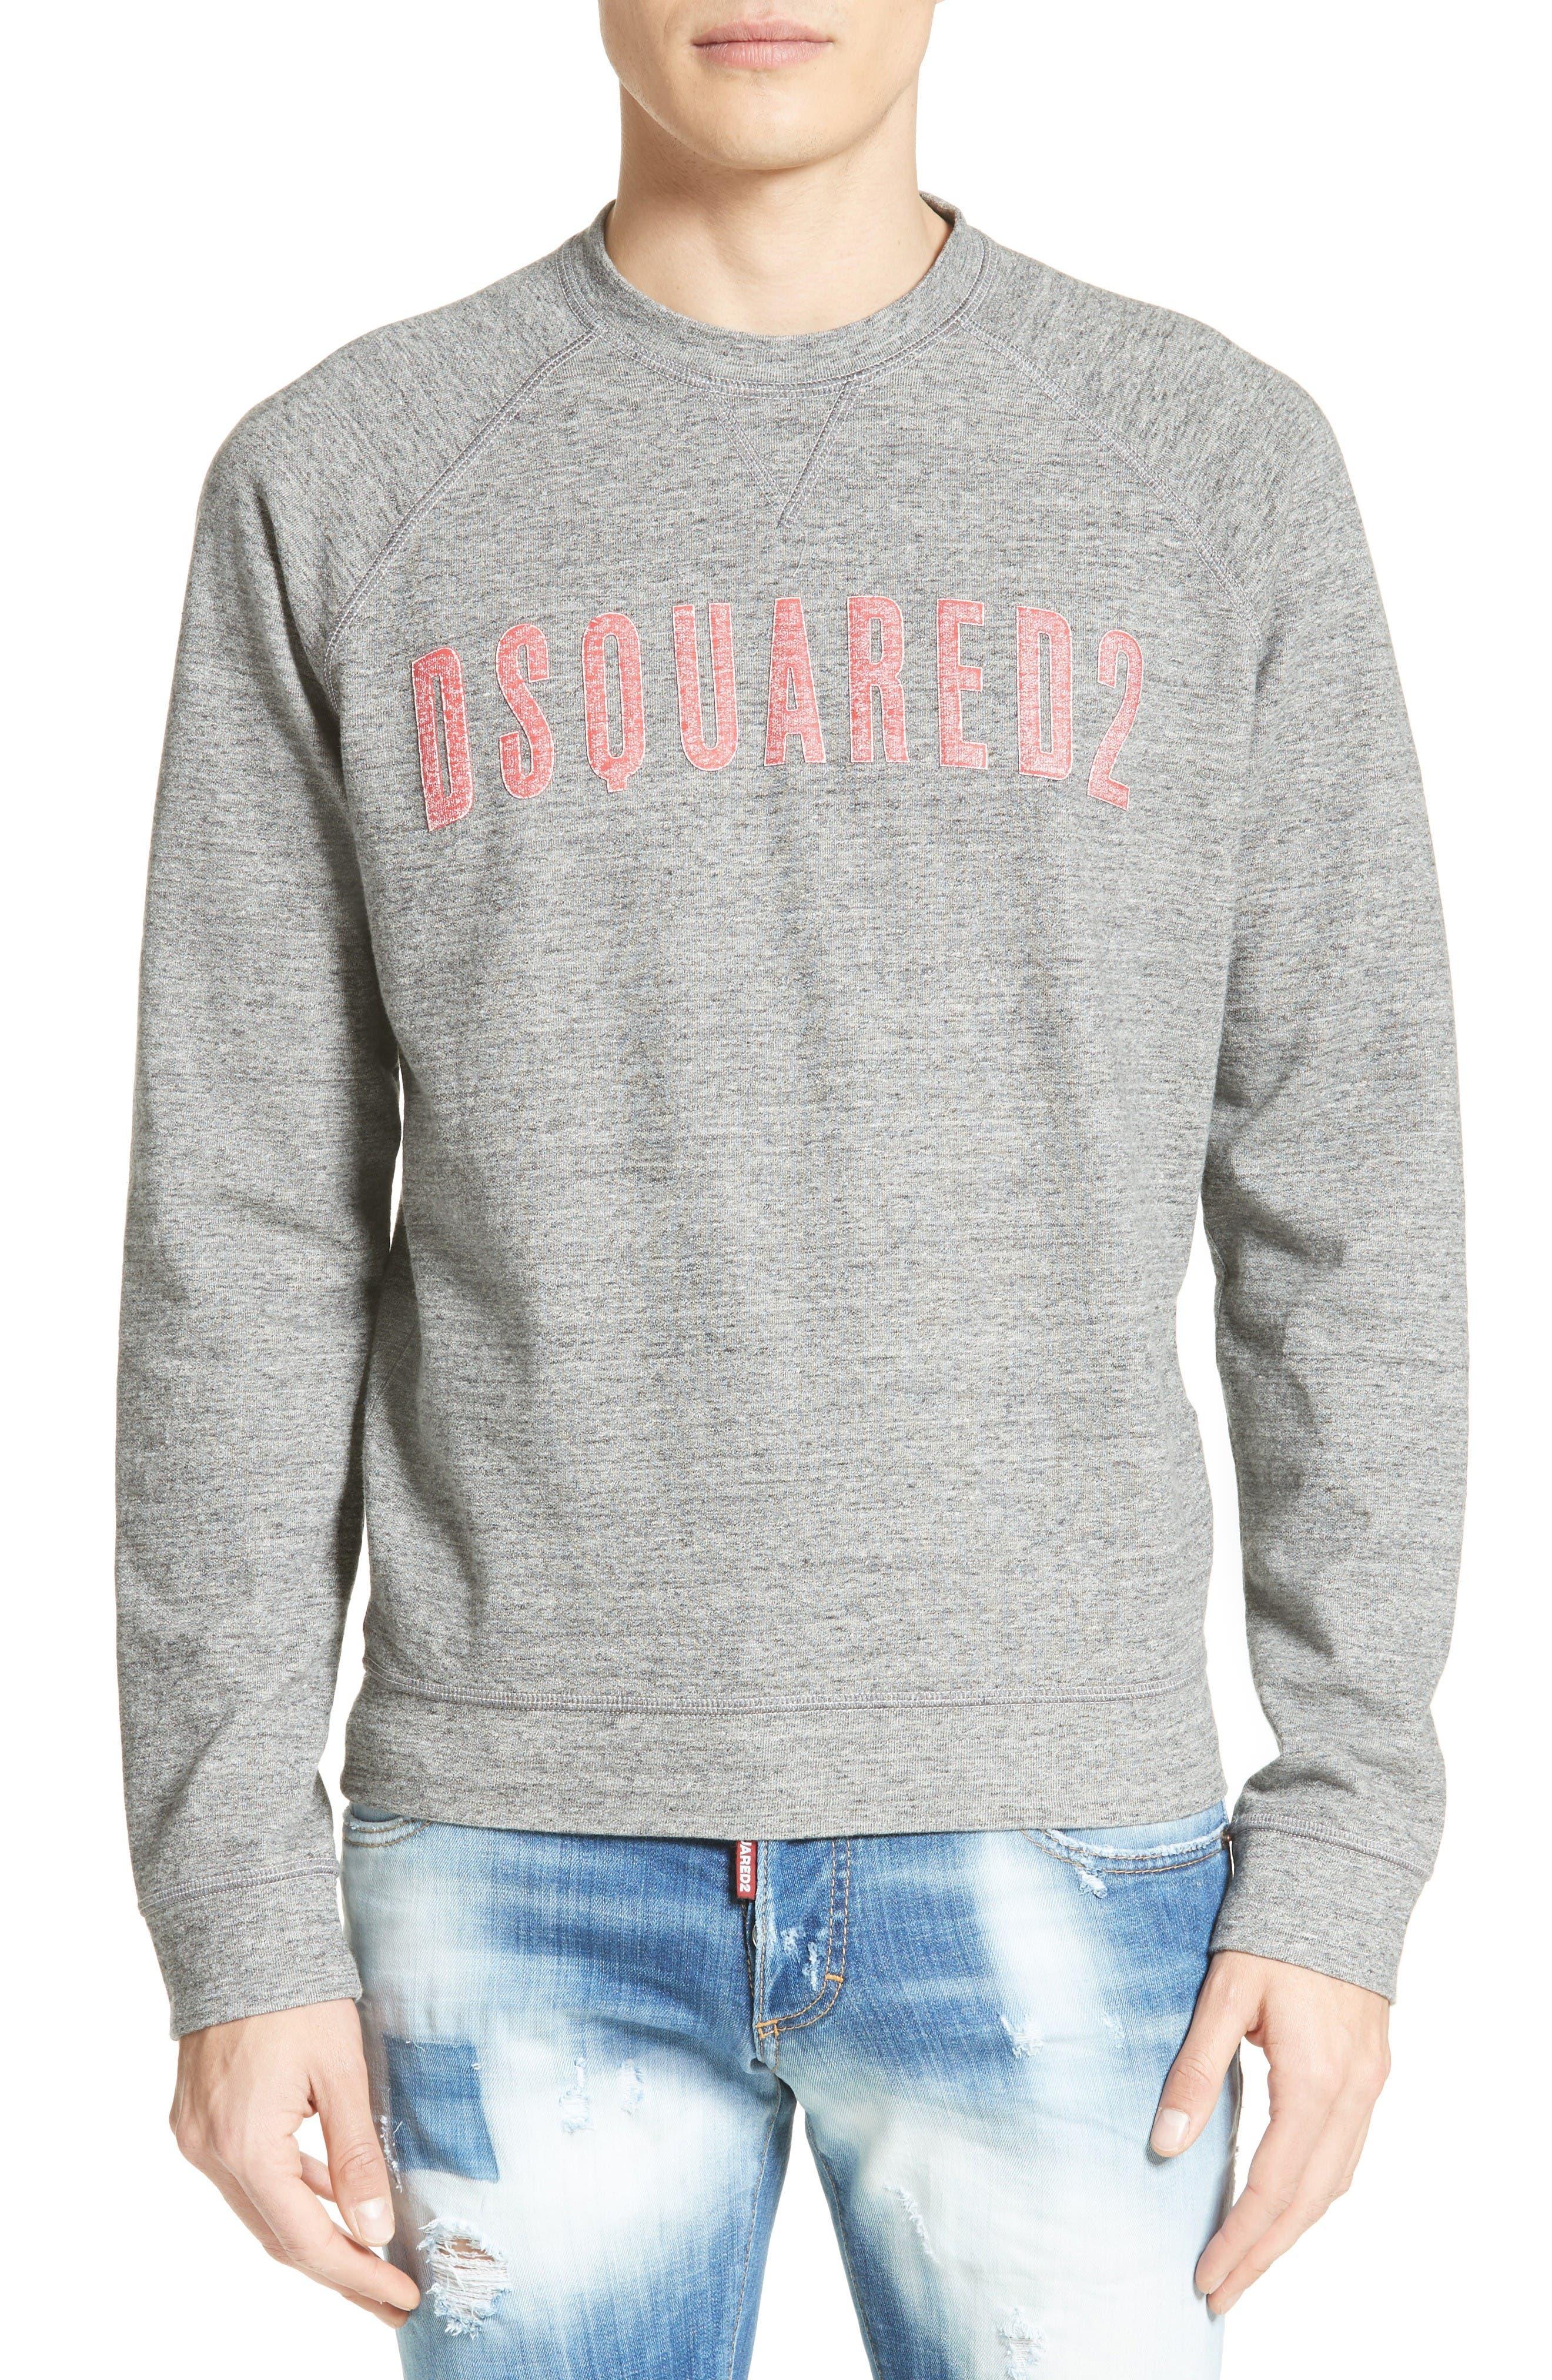 Dsquared2 Logo Graphic Sweatshirt